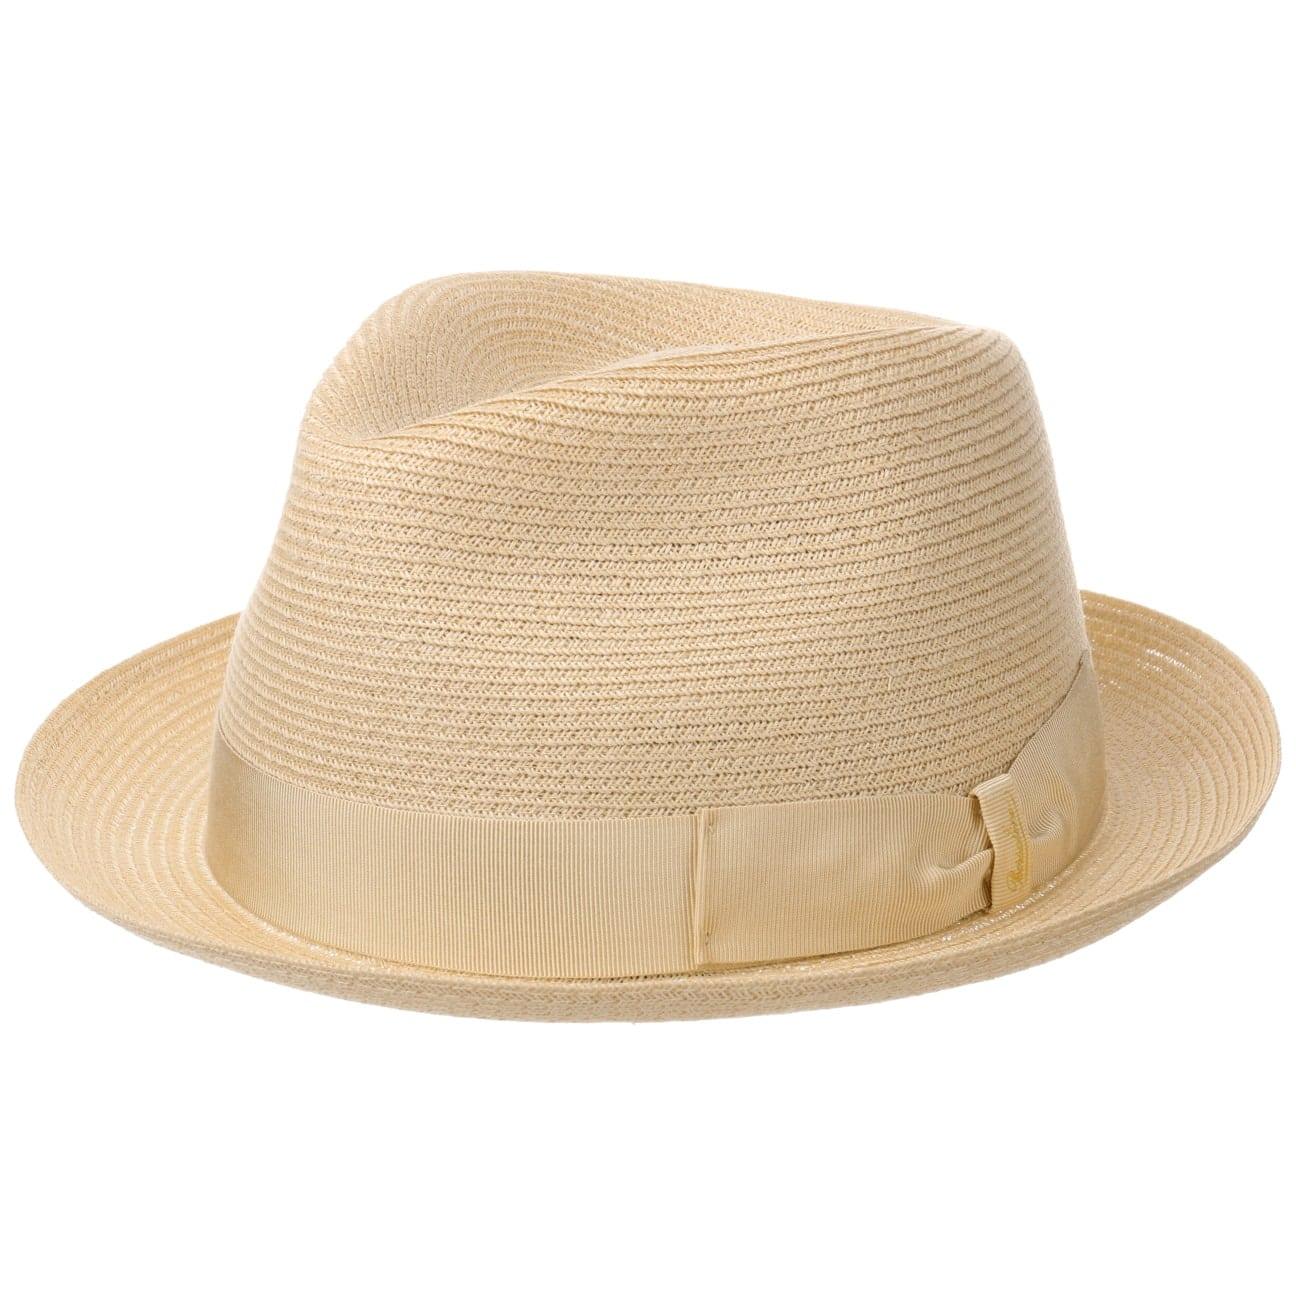 Chapeau en Chanvre Gennaro Player by Borsalino  chapeau de soleil